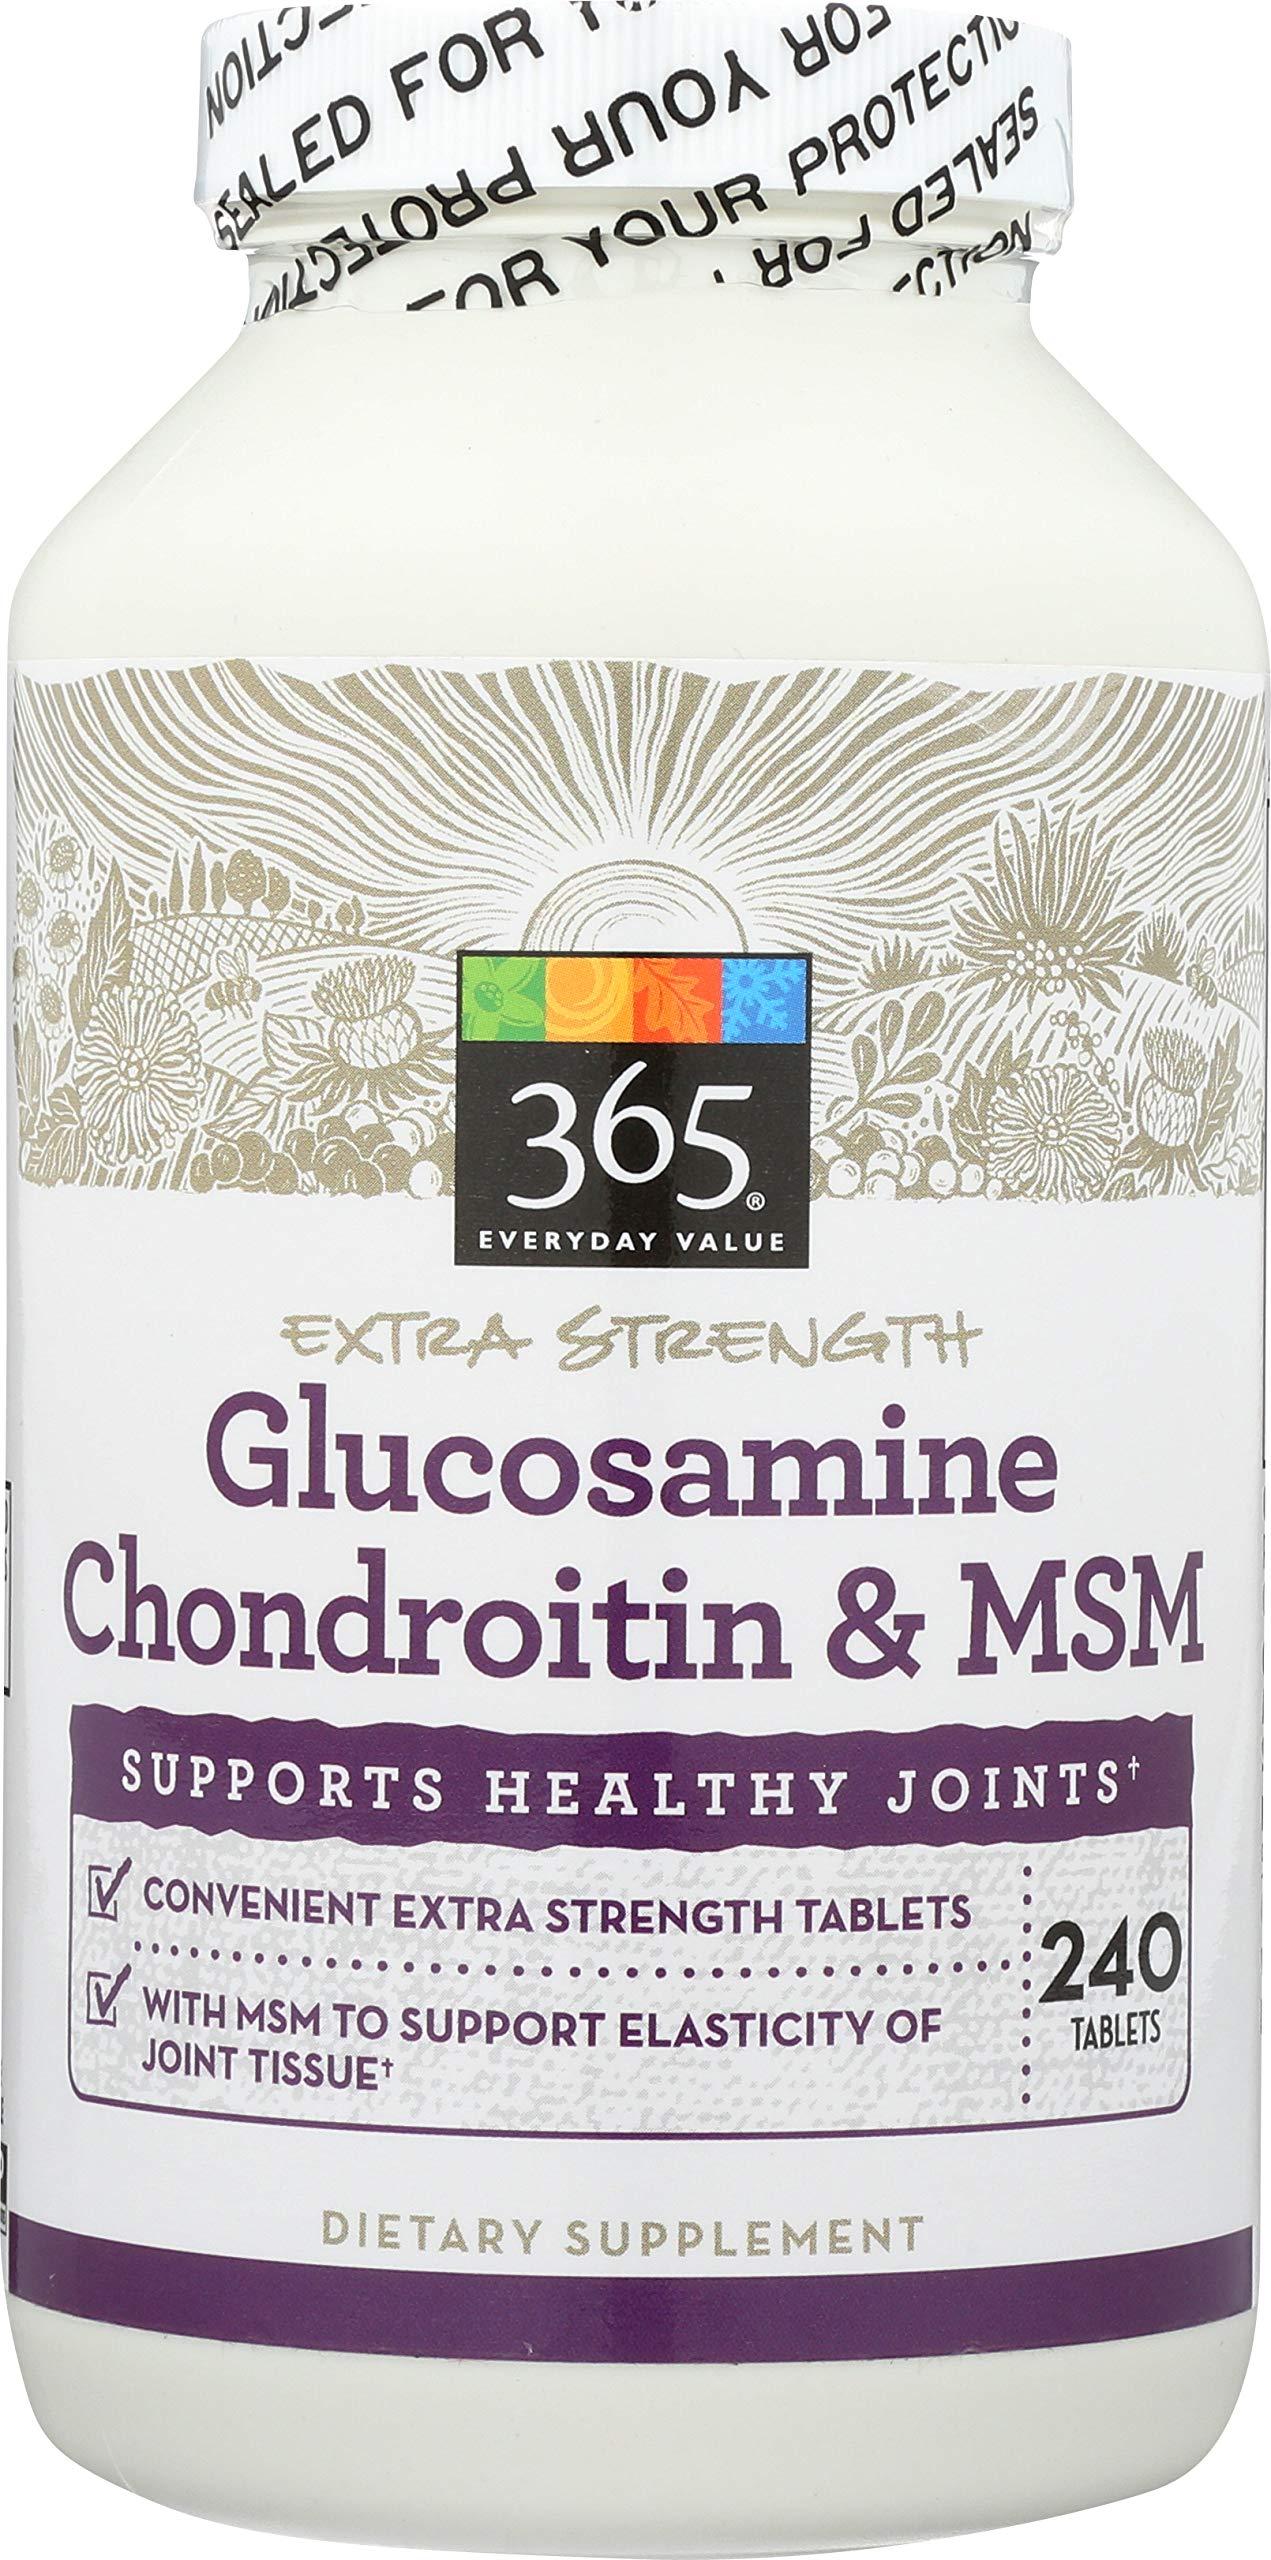 365 Everyday Value, Glucosamine Chondriotin & MSM, 240 ct